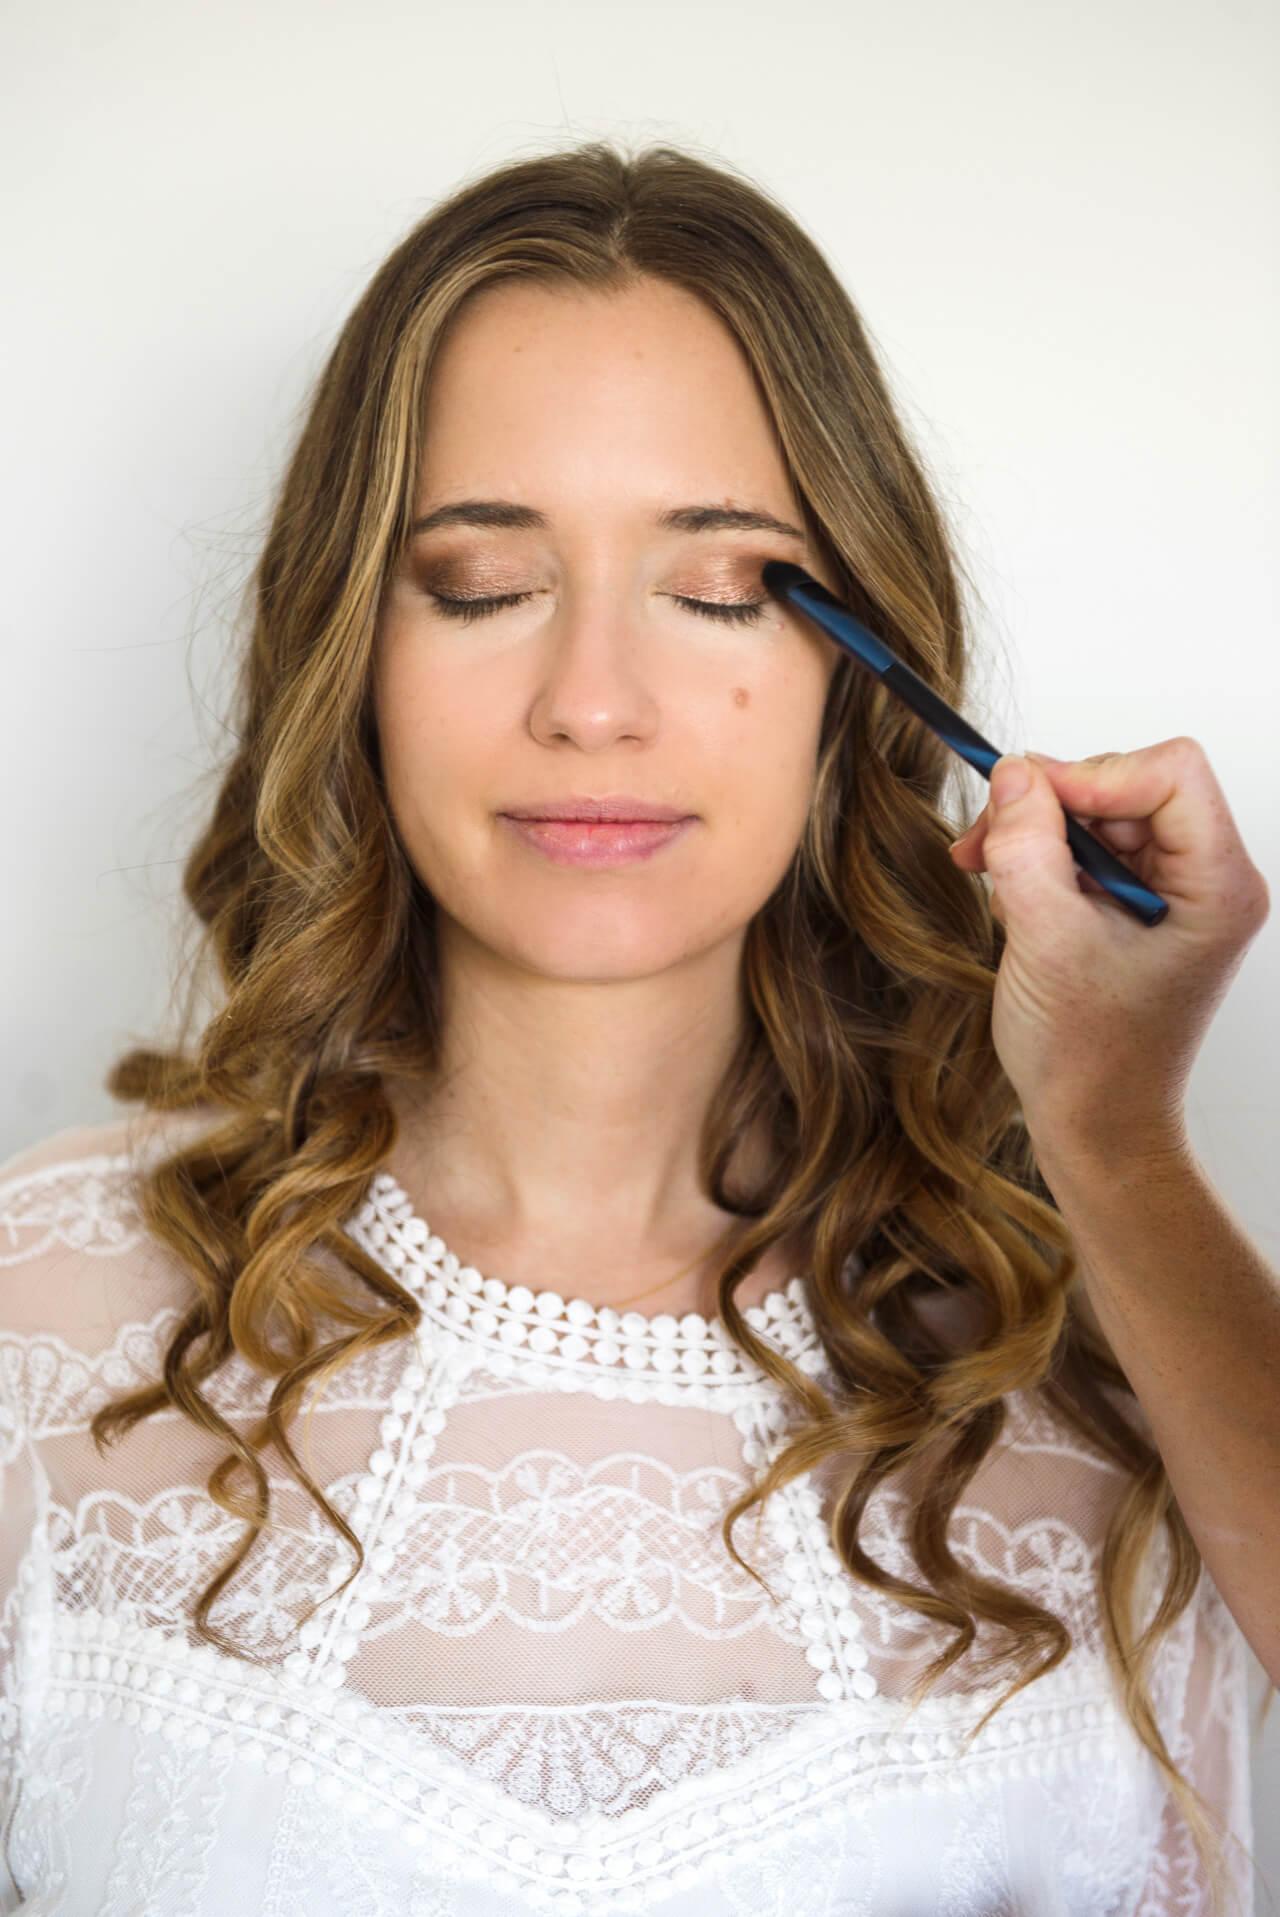 good eyeshadows to blend